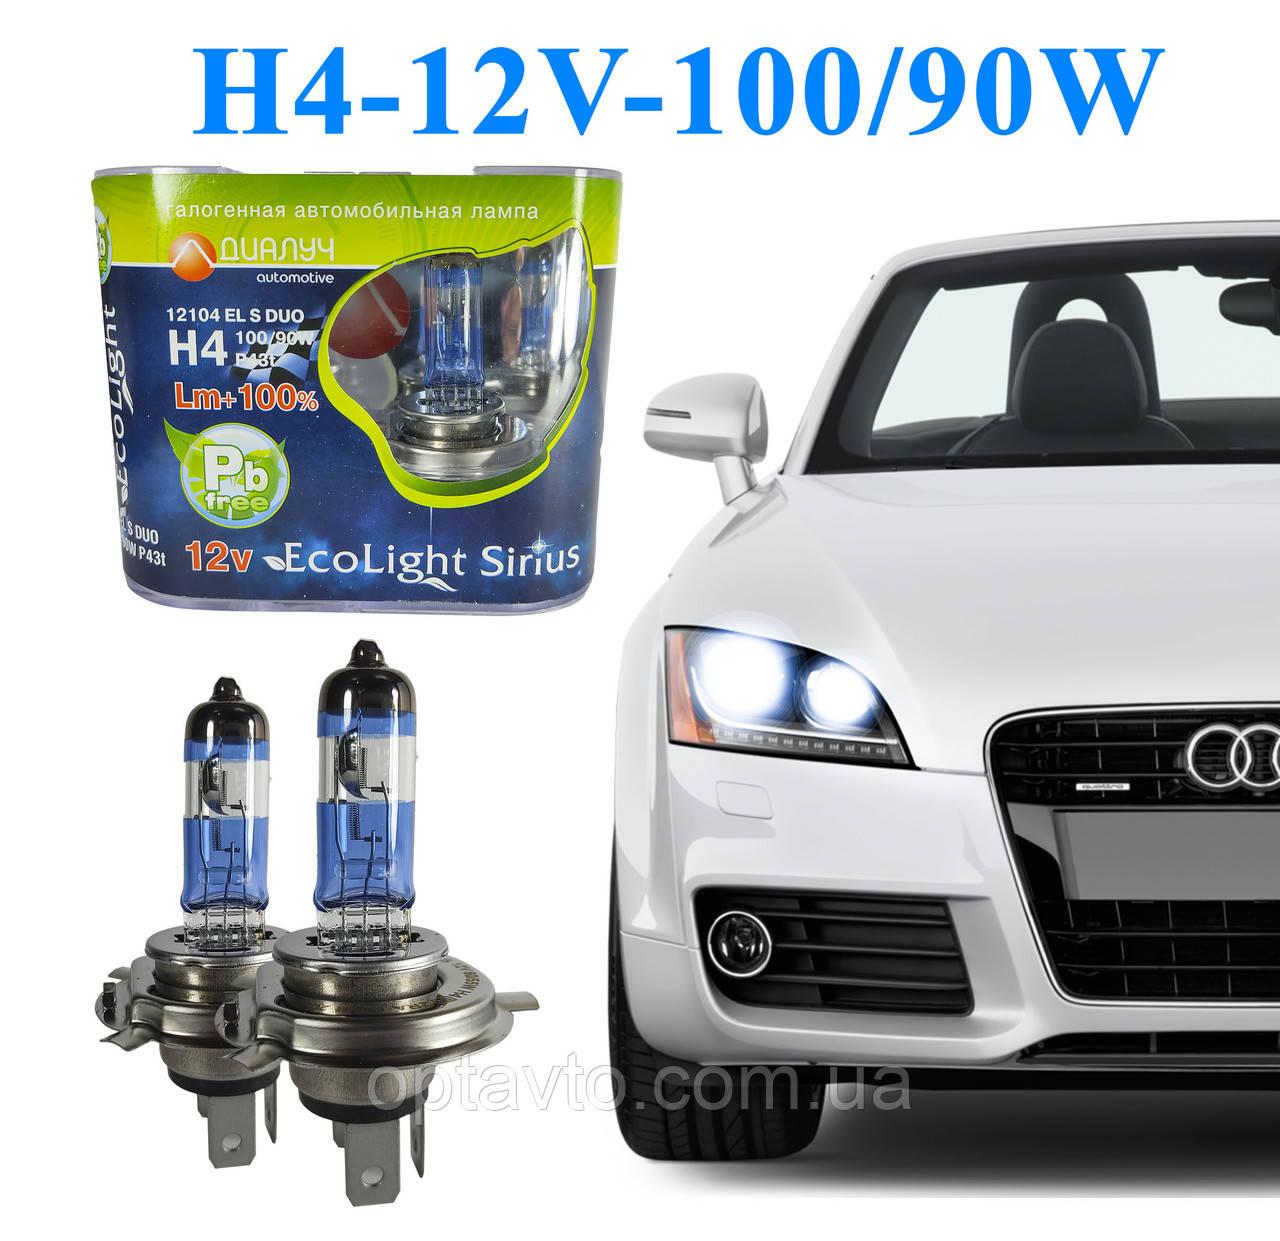 Лампы H-4 12V 100/90W +100% P43T. Лампы с эффектом ксенона Cool Blue Intense + 100%